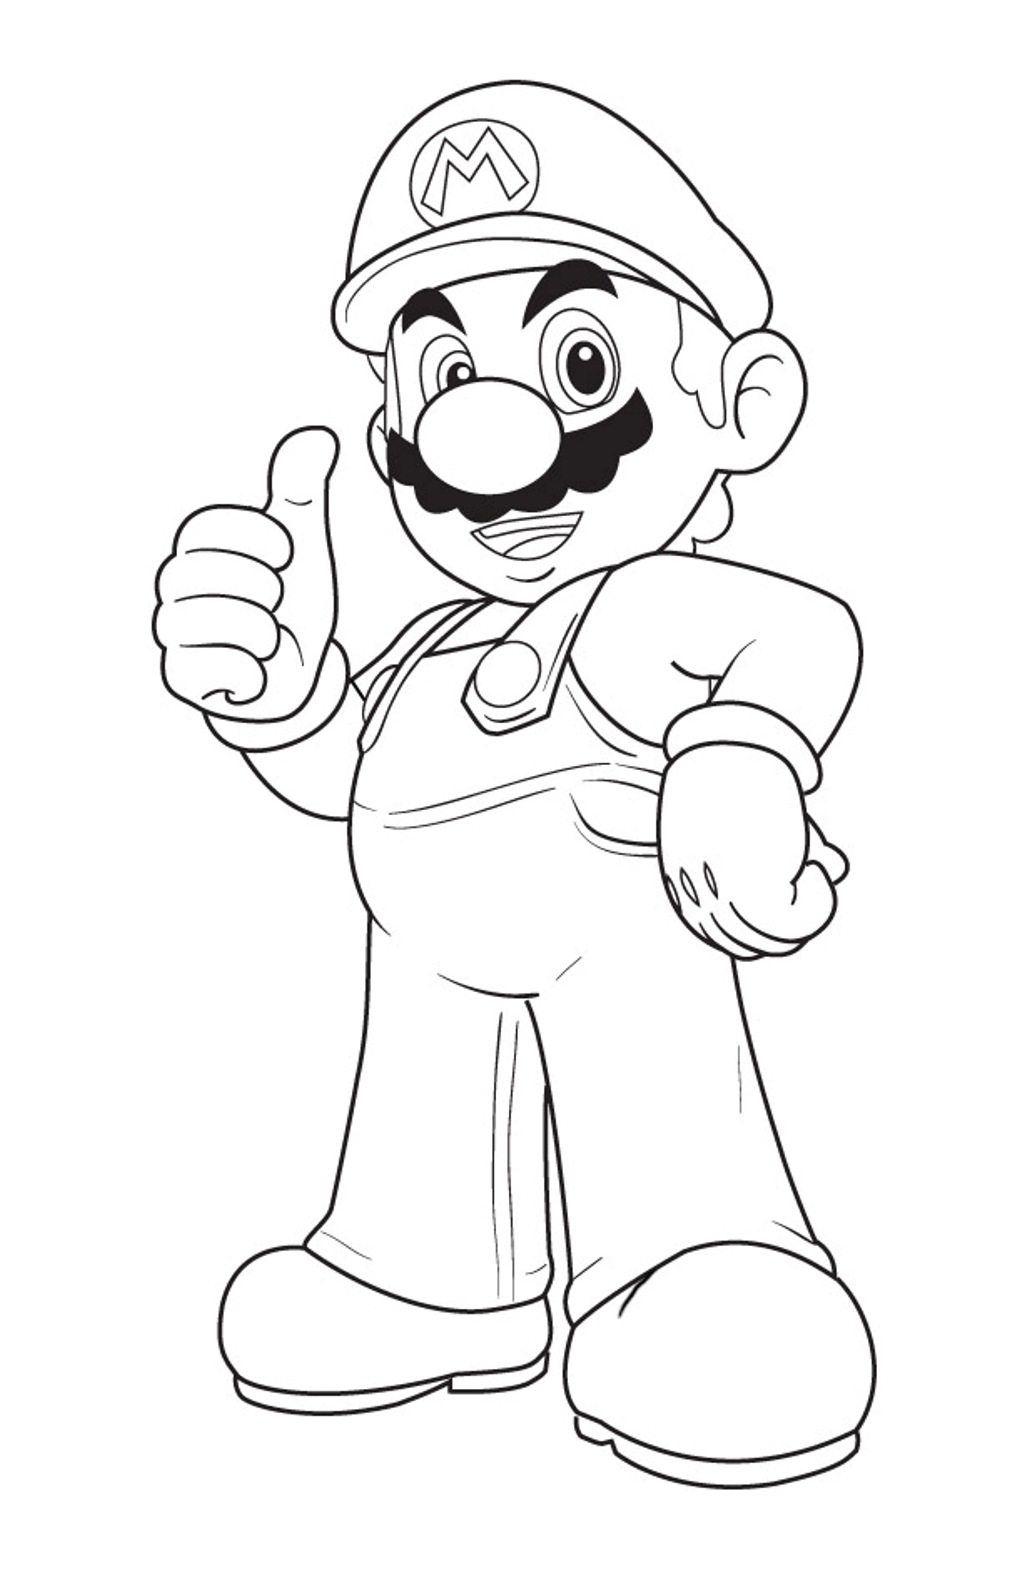 Cartoon Coloring Mario Bros Coloring Pages Free Mario Bros Coloring Pages Freefull Size Mario Coloring Pages Super Mario Coloring Pages Minion Coloring Pages